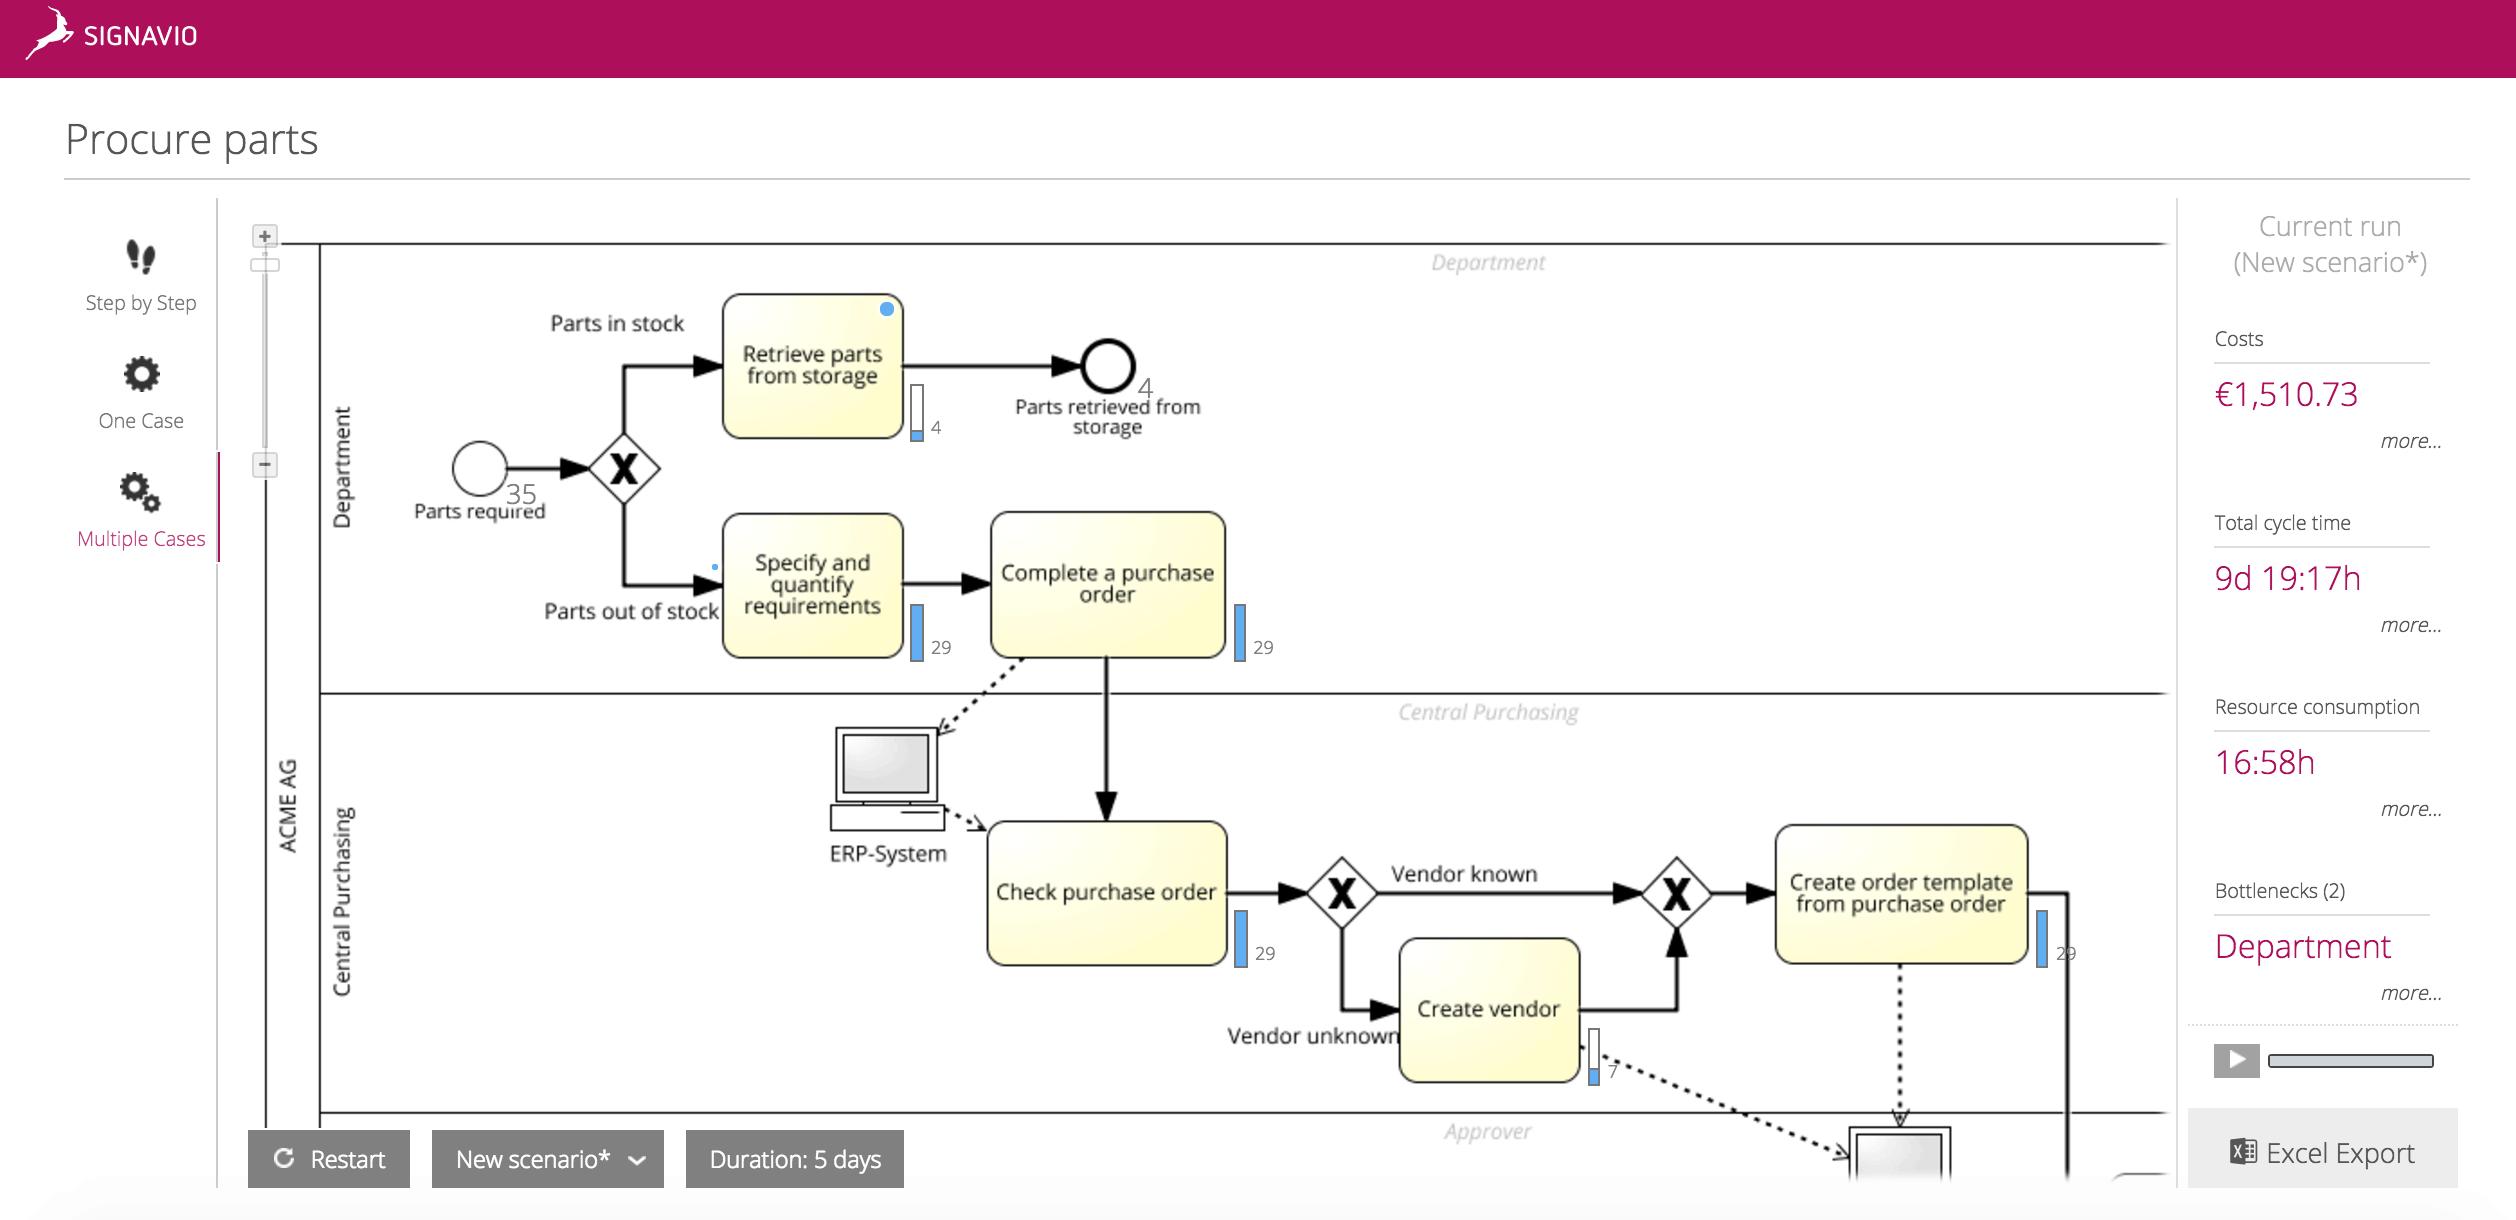 BPM Simulation Dashboard Screenshot after redesign